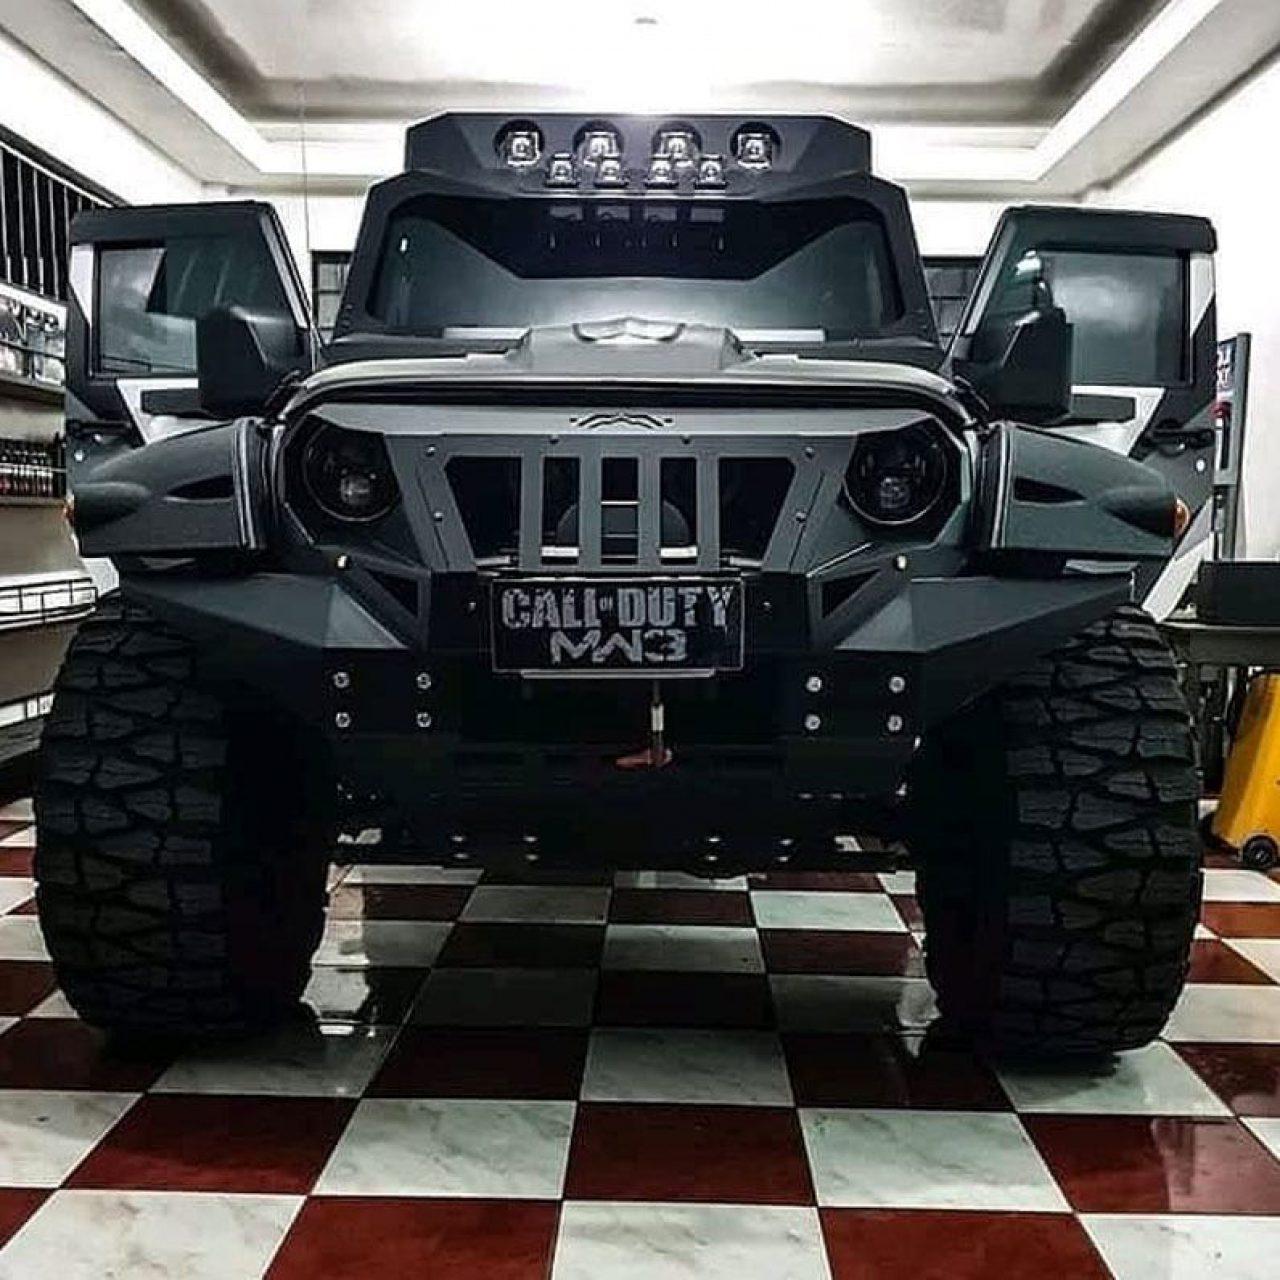 Coco martin Jeep Wrangler MW3